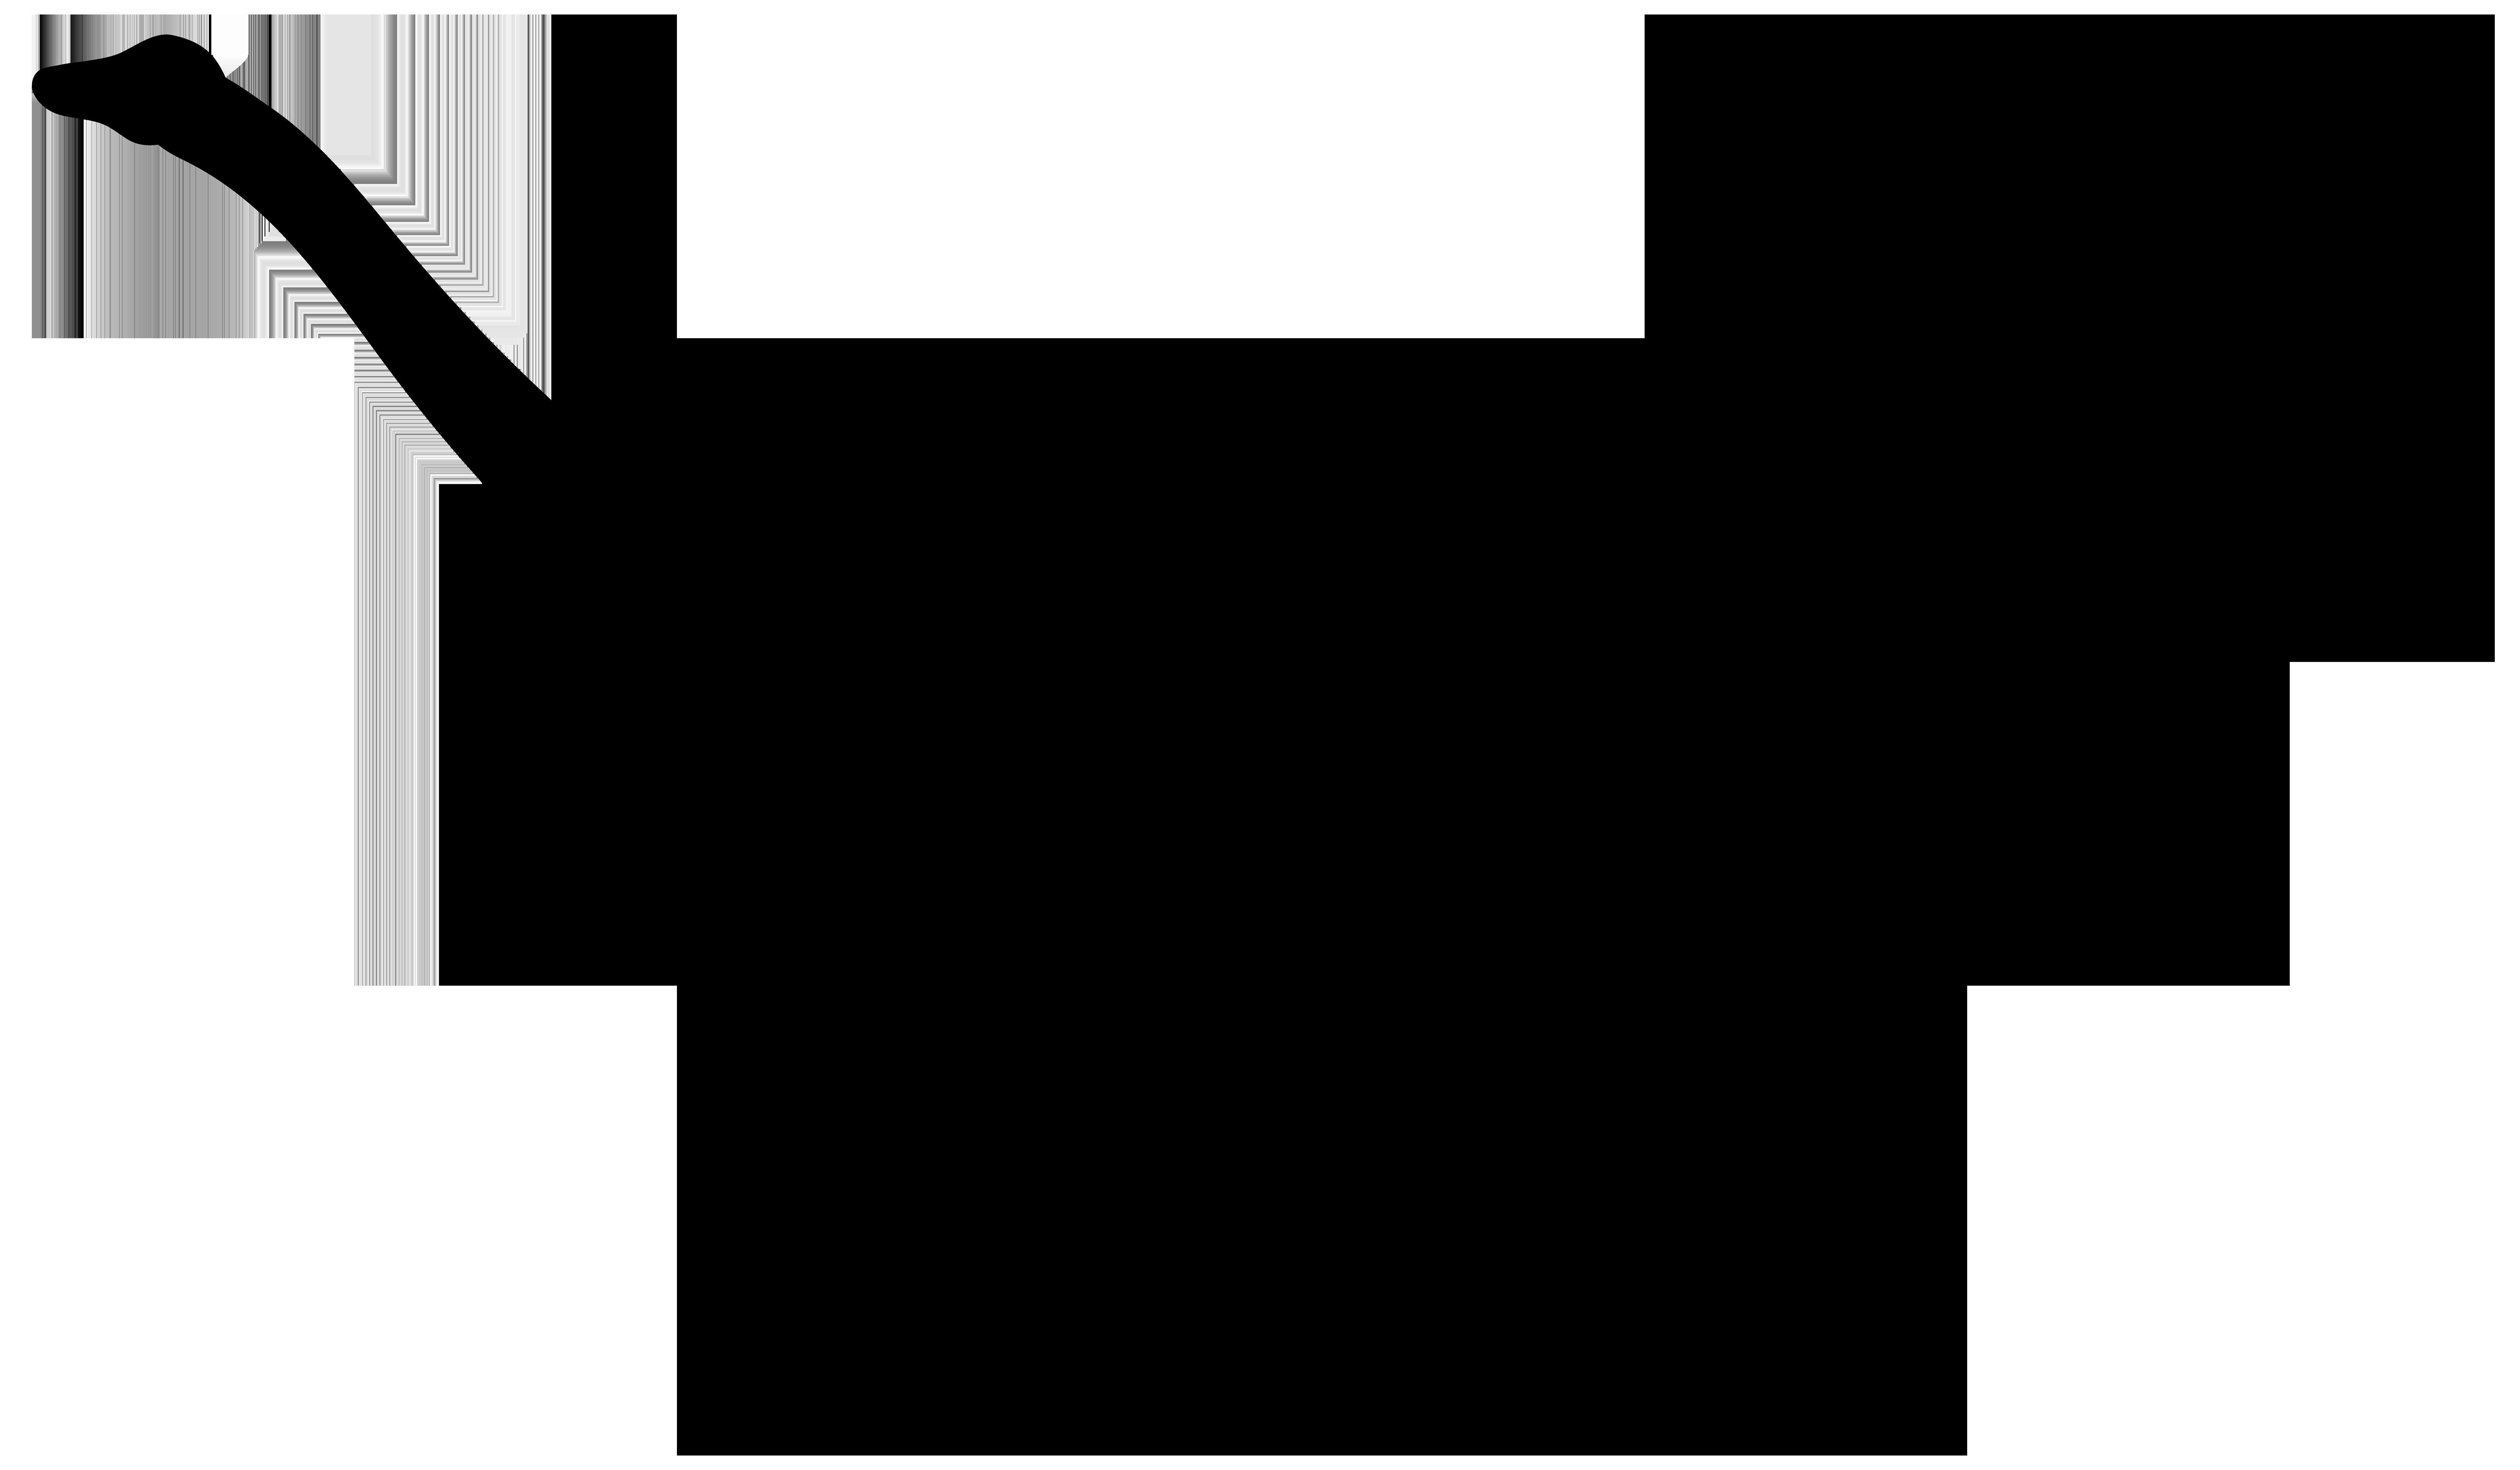 Clipart bible silhouette. Clip art dinosaur png